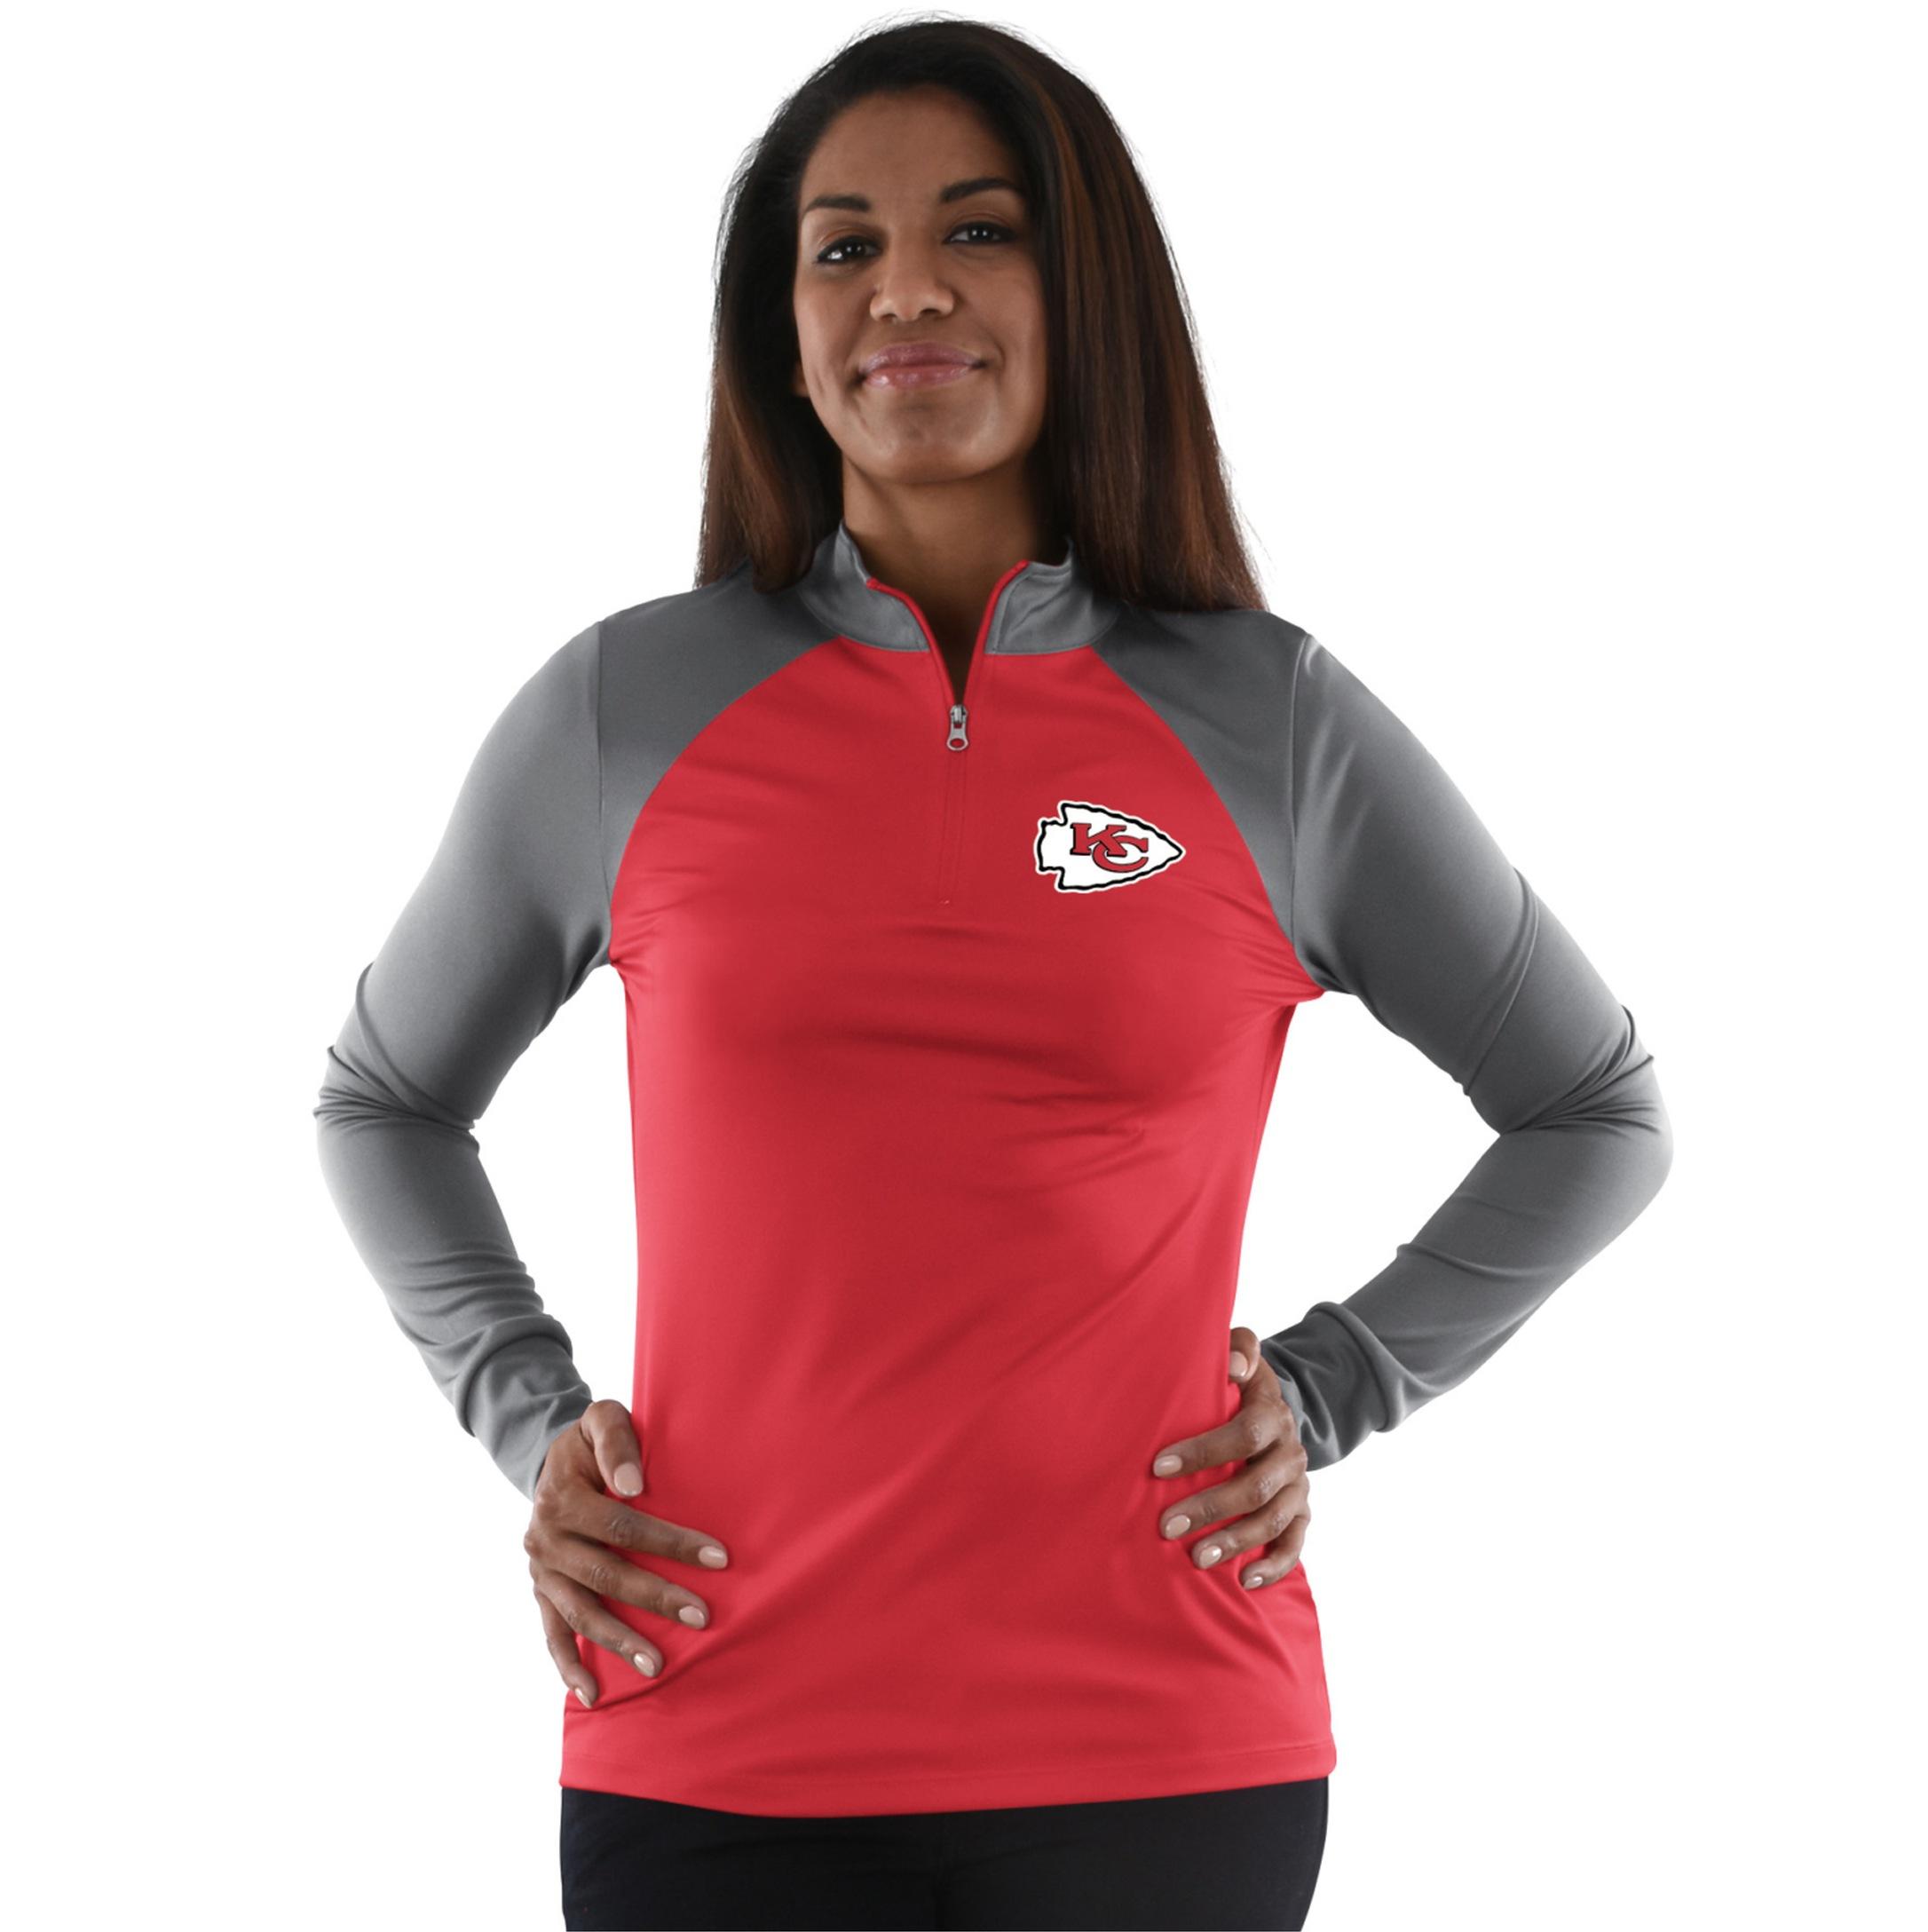 NFL Women's Quarter-Zip Long-Sleeve Top - Kansas City Chiefs PartNumber: 046VA99186712P MfgPartNumber: DEAY-8R2